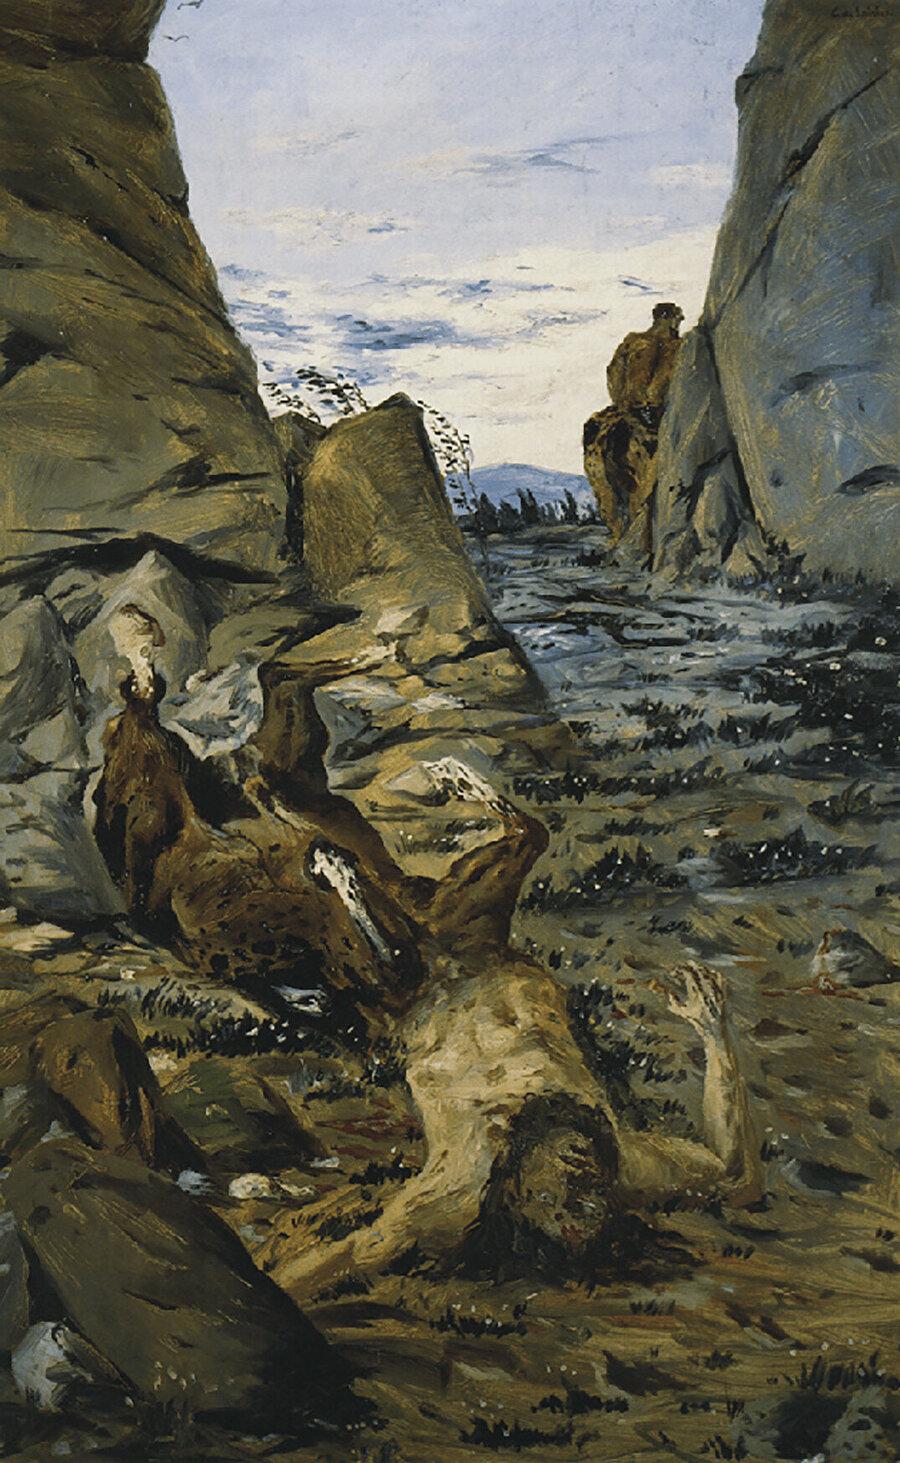 The Dying Centaur, 1909.